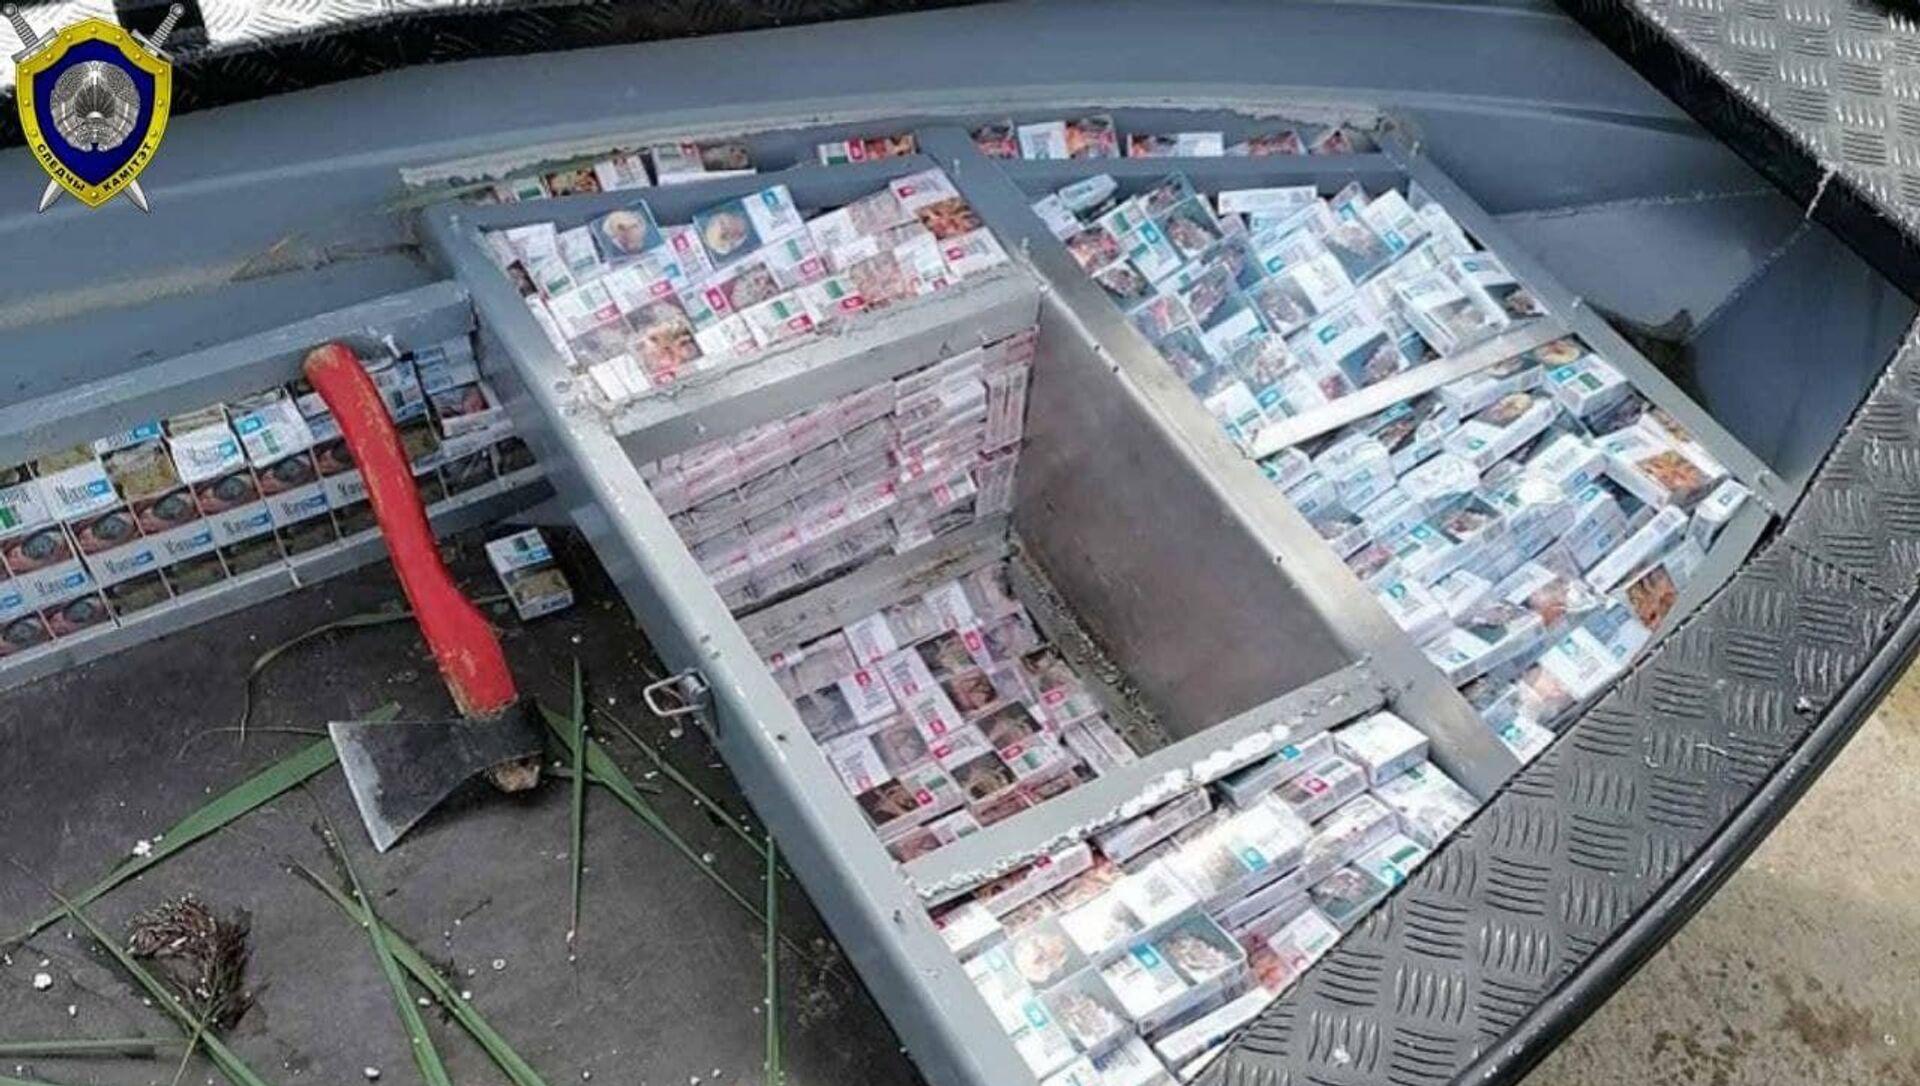 Контрабандные сигареты изъяли на границе Беларуси и Литвы - Sputnik Беларусь, 1920, 22.04.2021